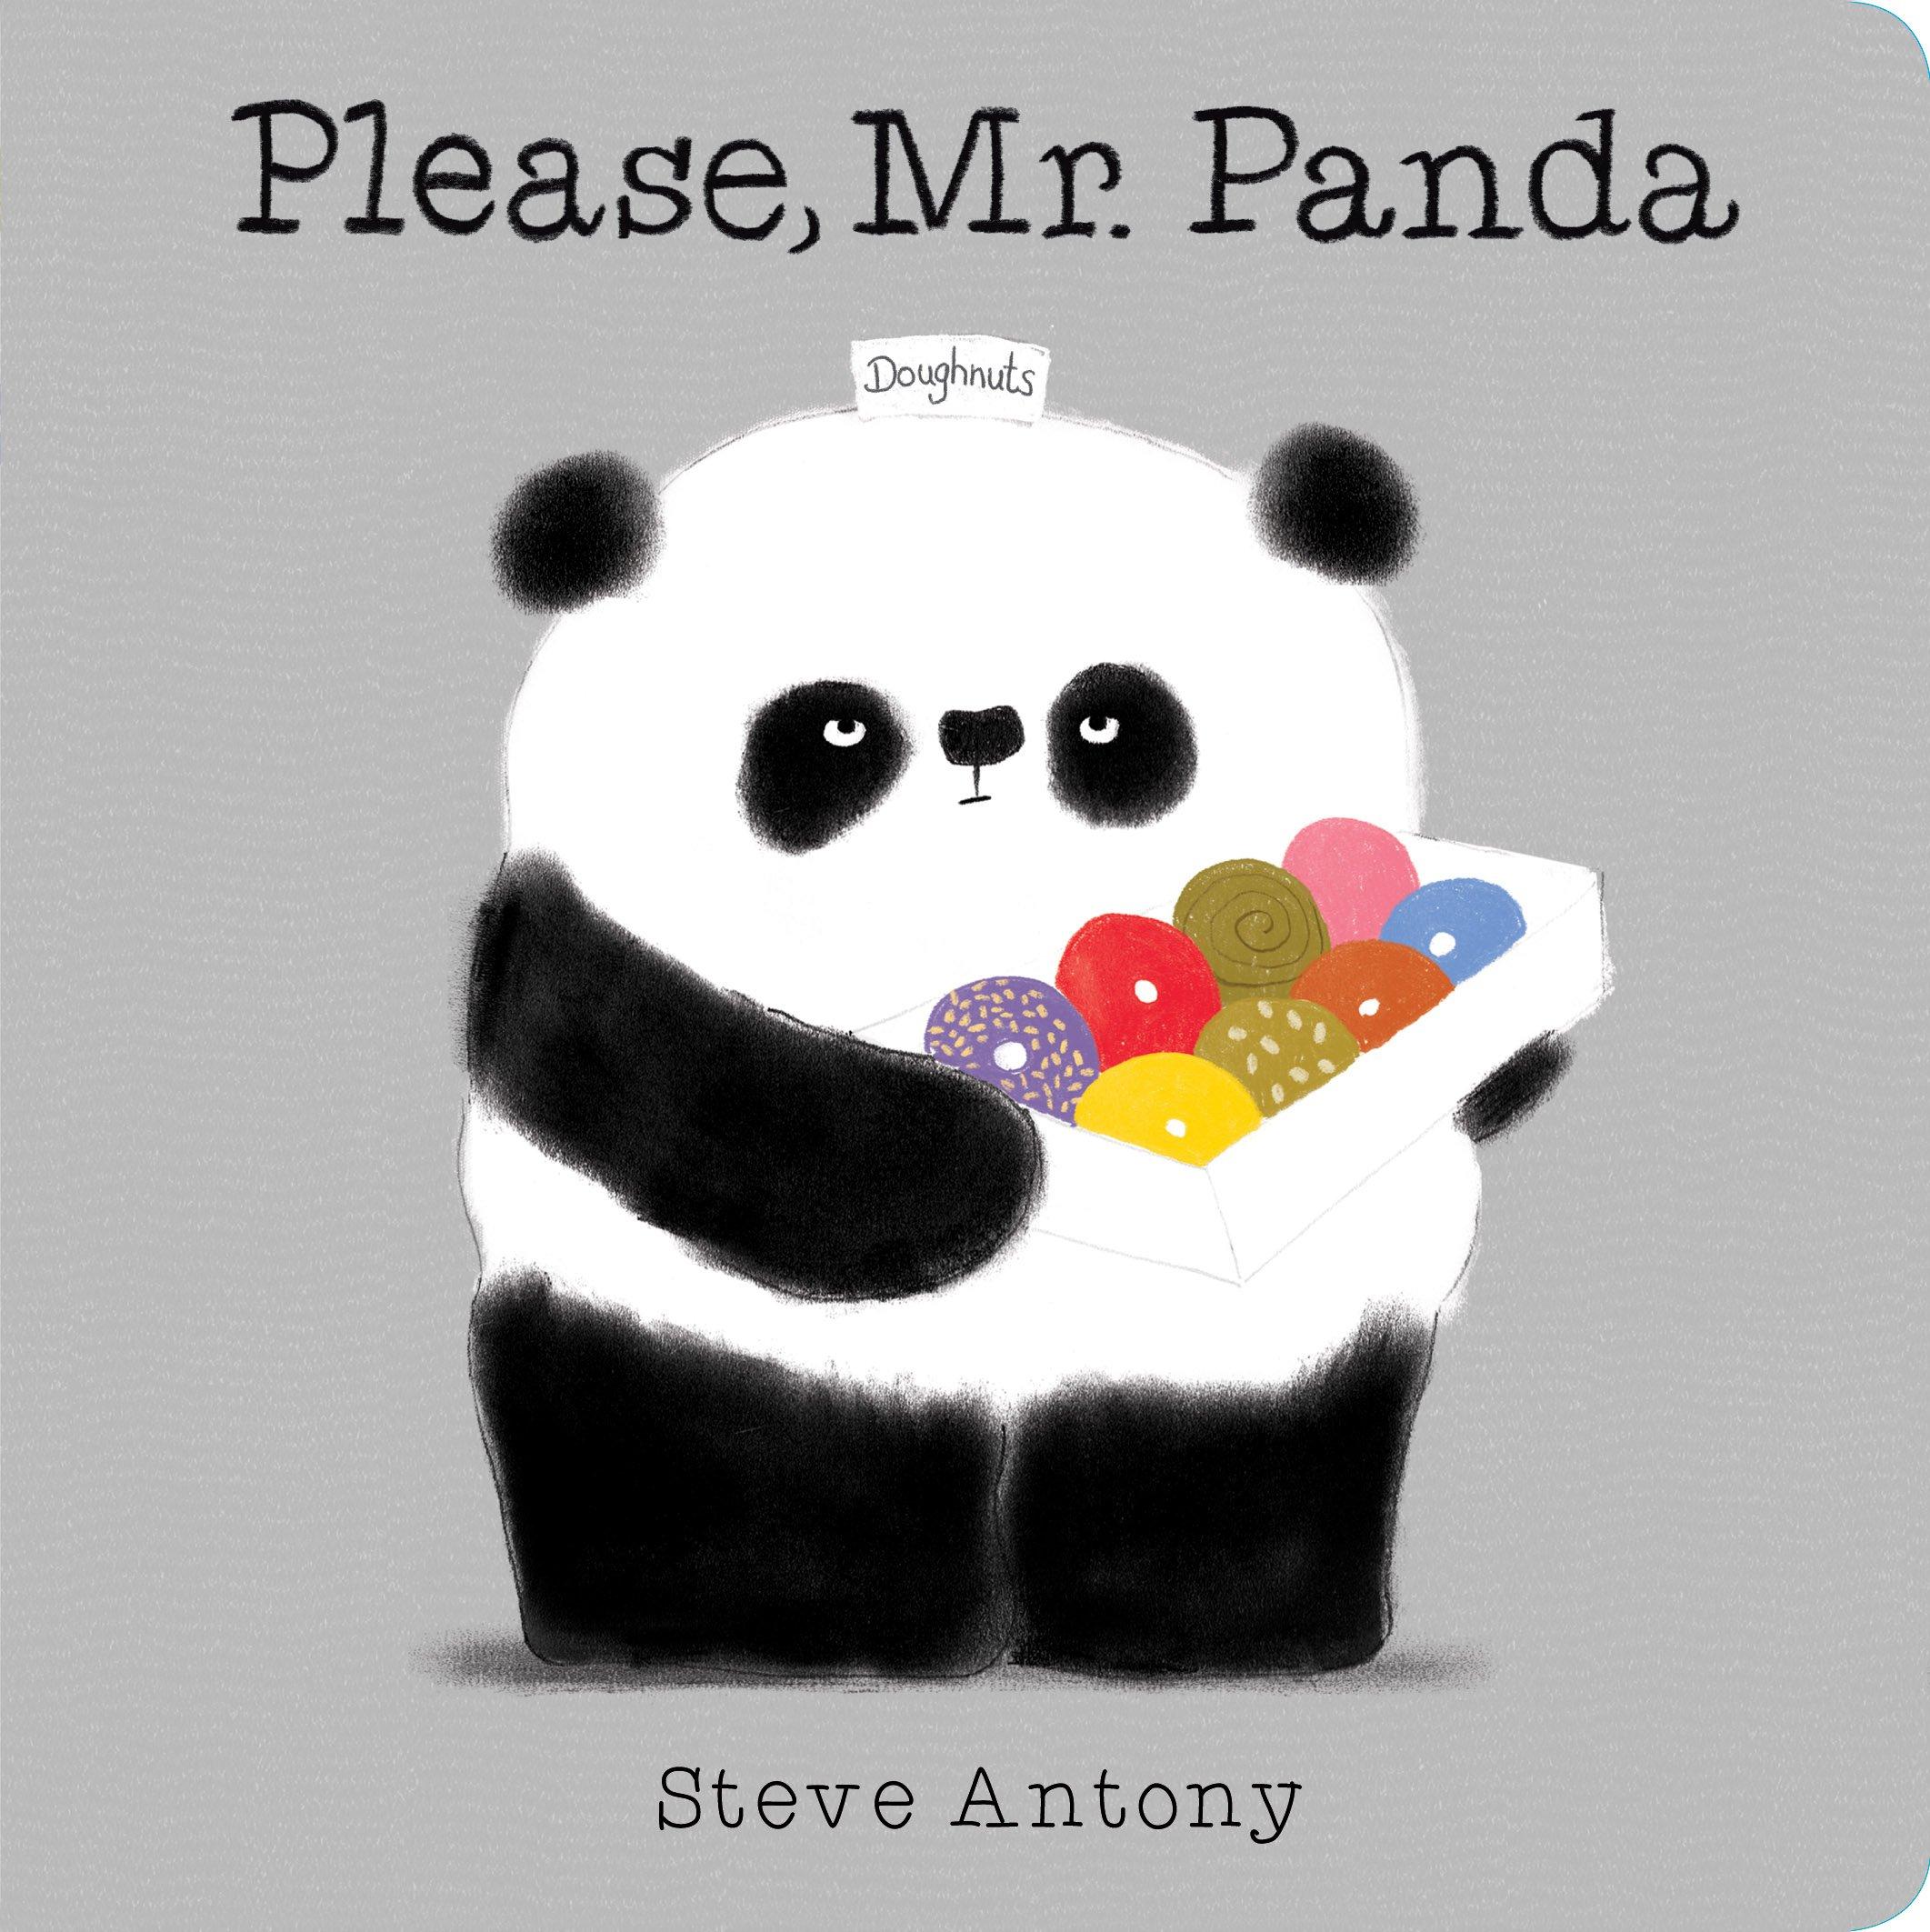 Please, Mr. Panda (A Board Book): Antony, Steve, Antony, Steve:  9781338106480: Amazon.com: Books